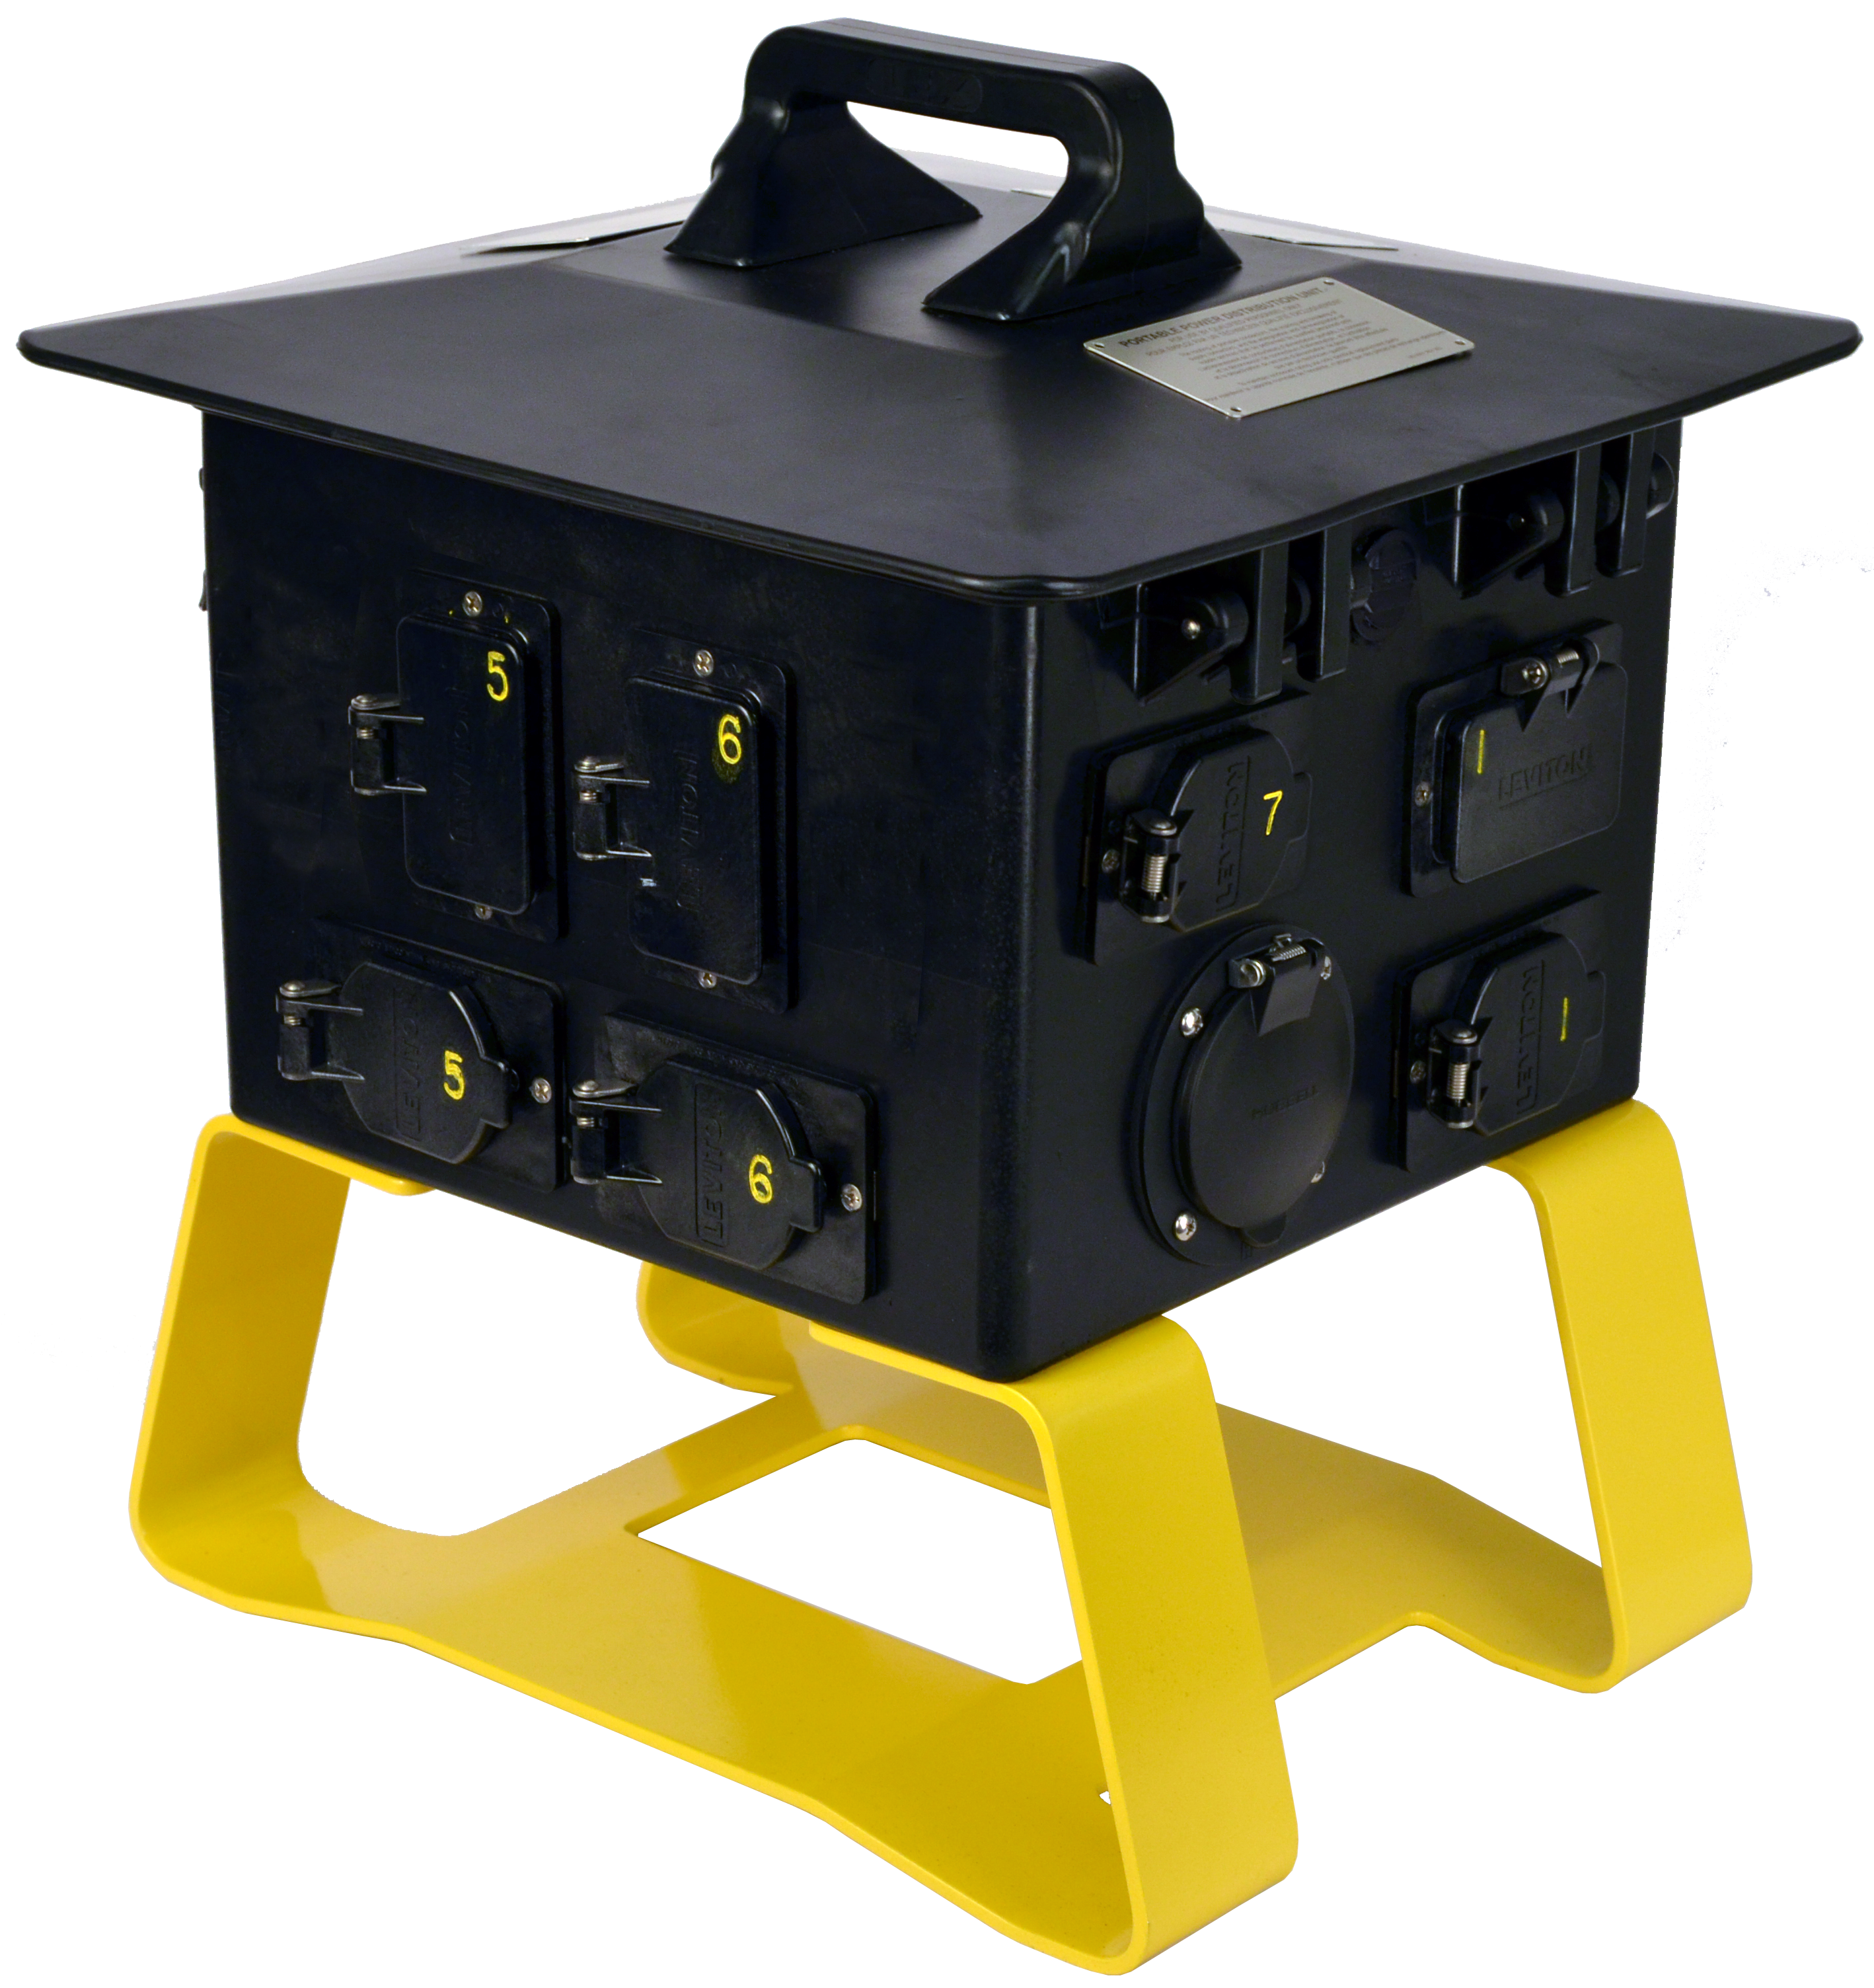 50 Amp Terrapin Station II™ to Locking Receptacles, Feed Thru 50 Amp Terrapin Station II™ to Locking Receptacles, Feed Thru Spider Box to GFCI L5-20/L6-30 Receptacles